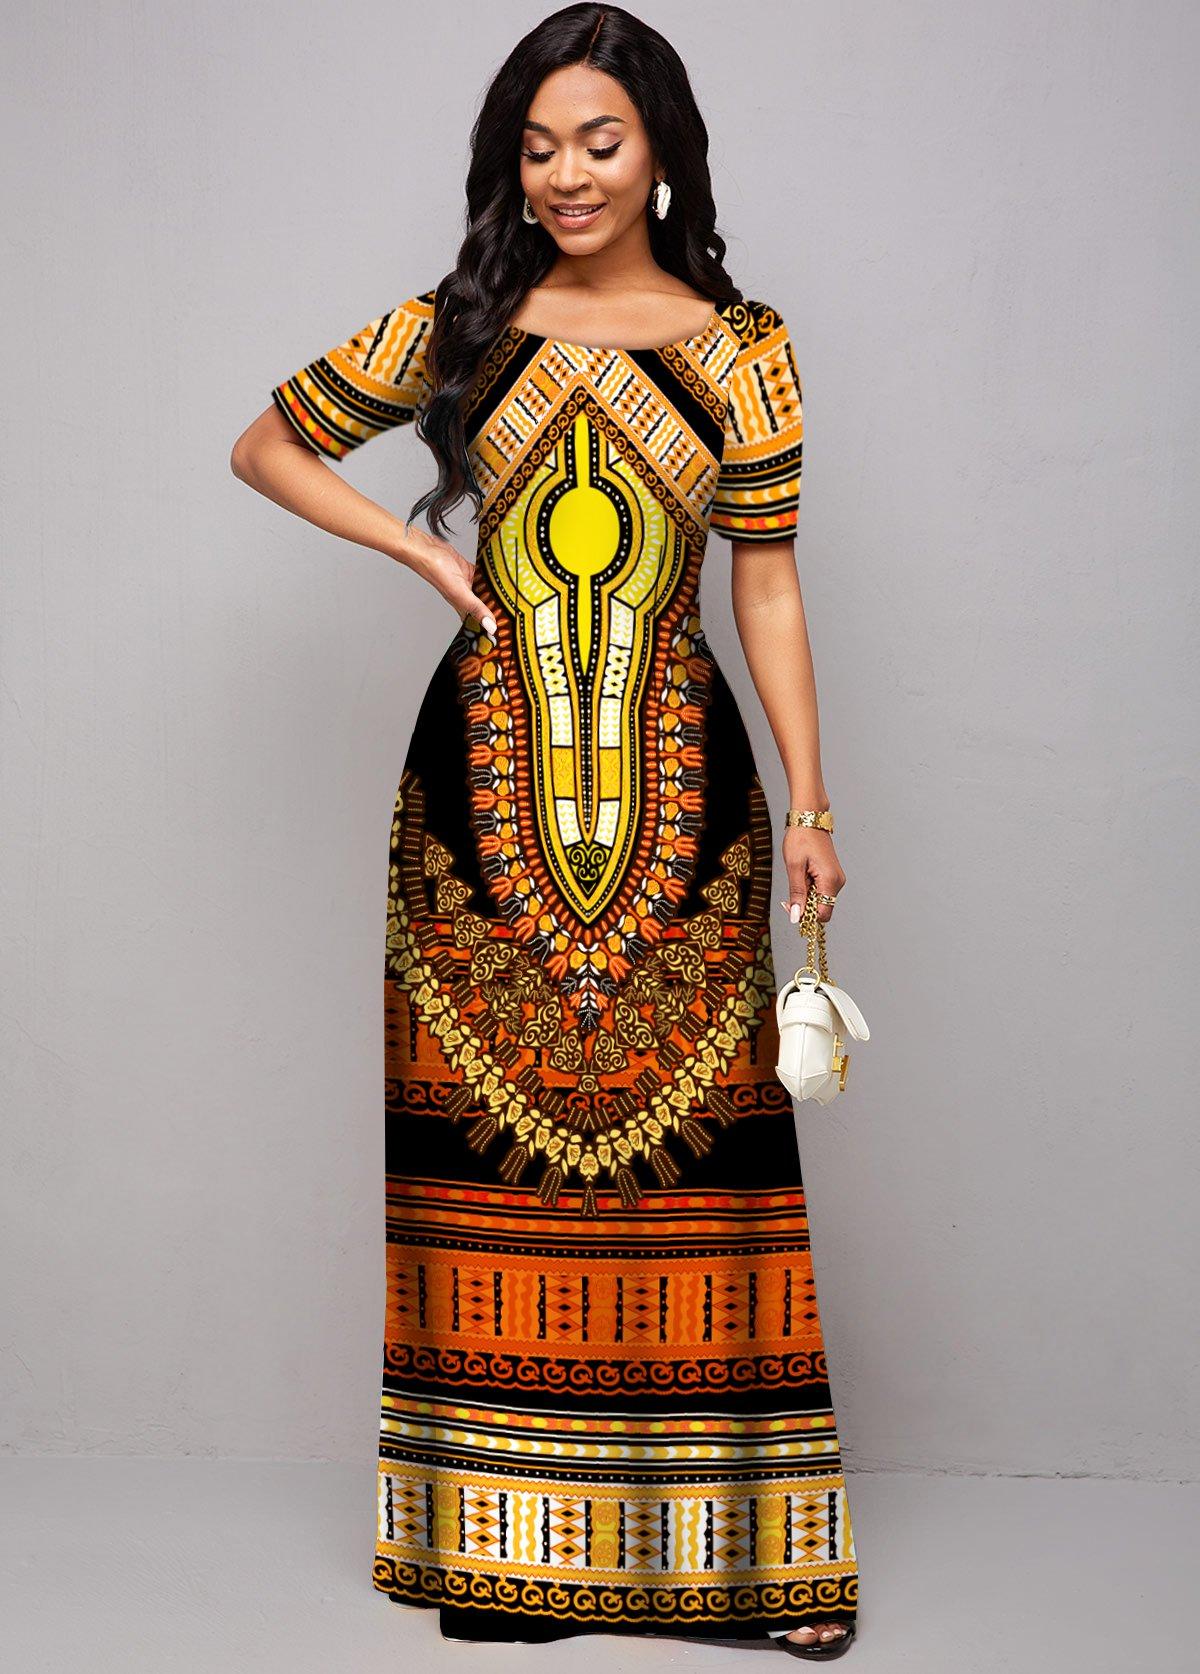 Tribal Print Round Neck Short Sleeve Dress